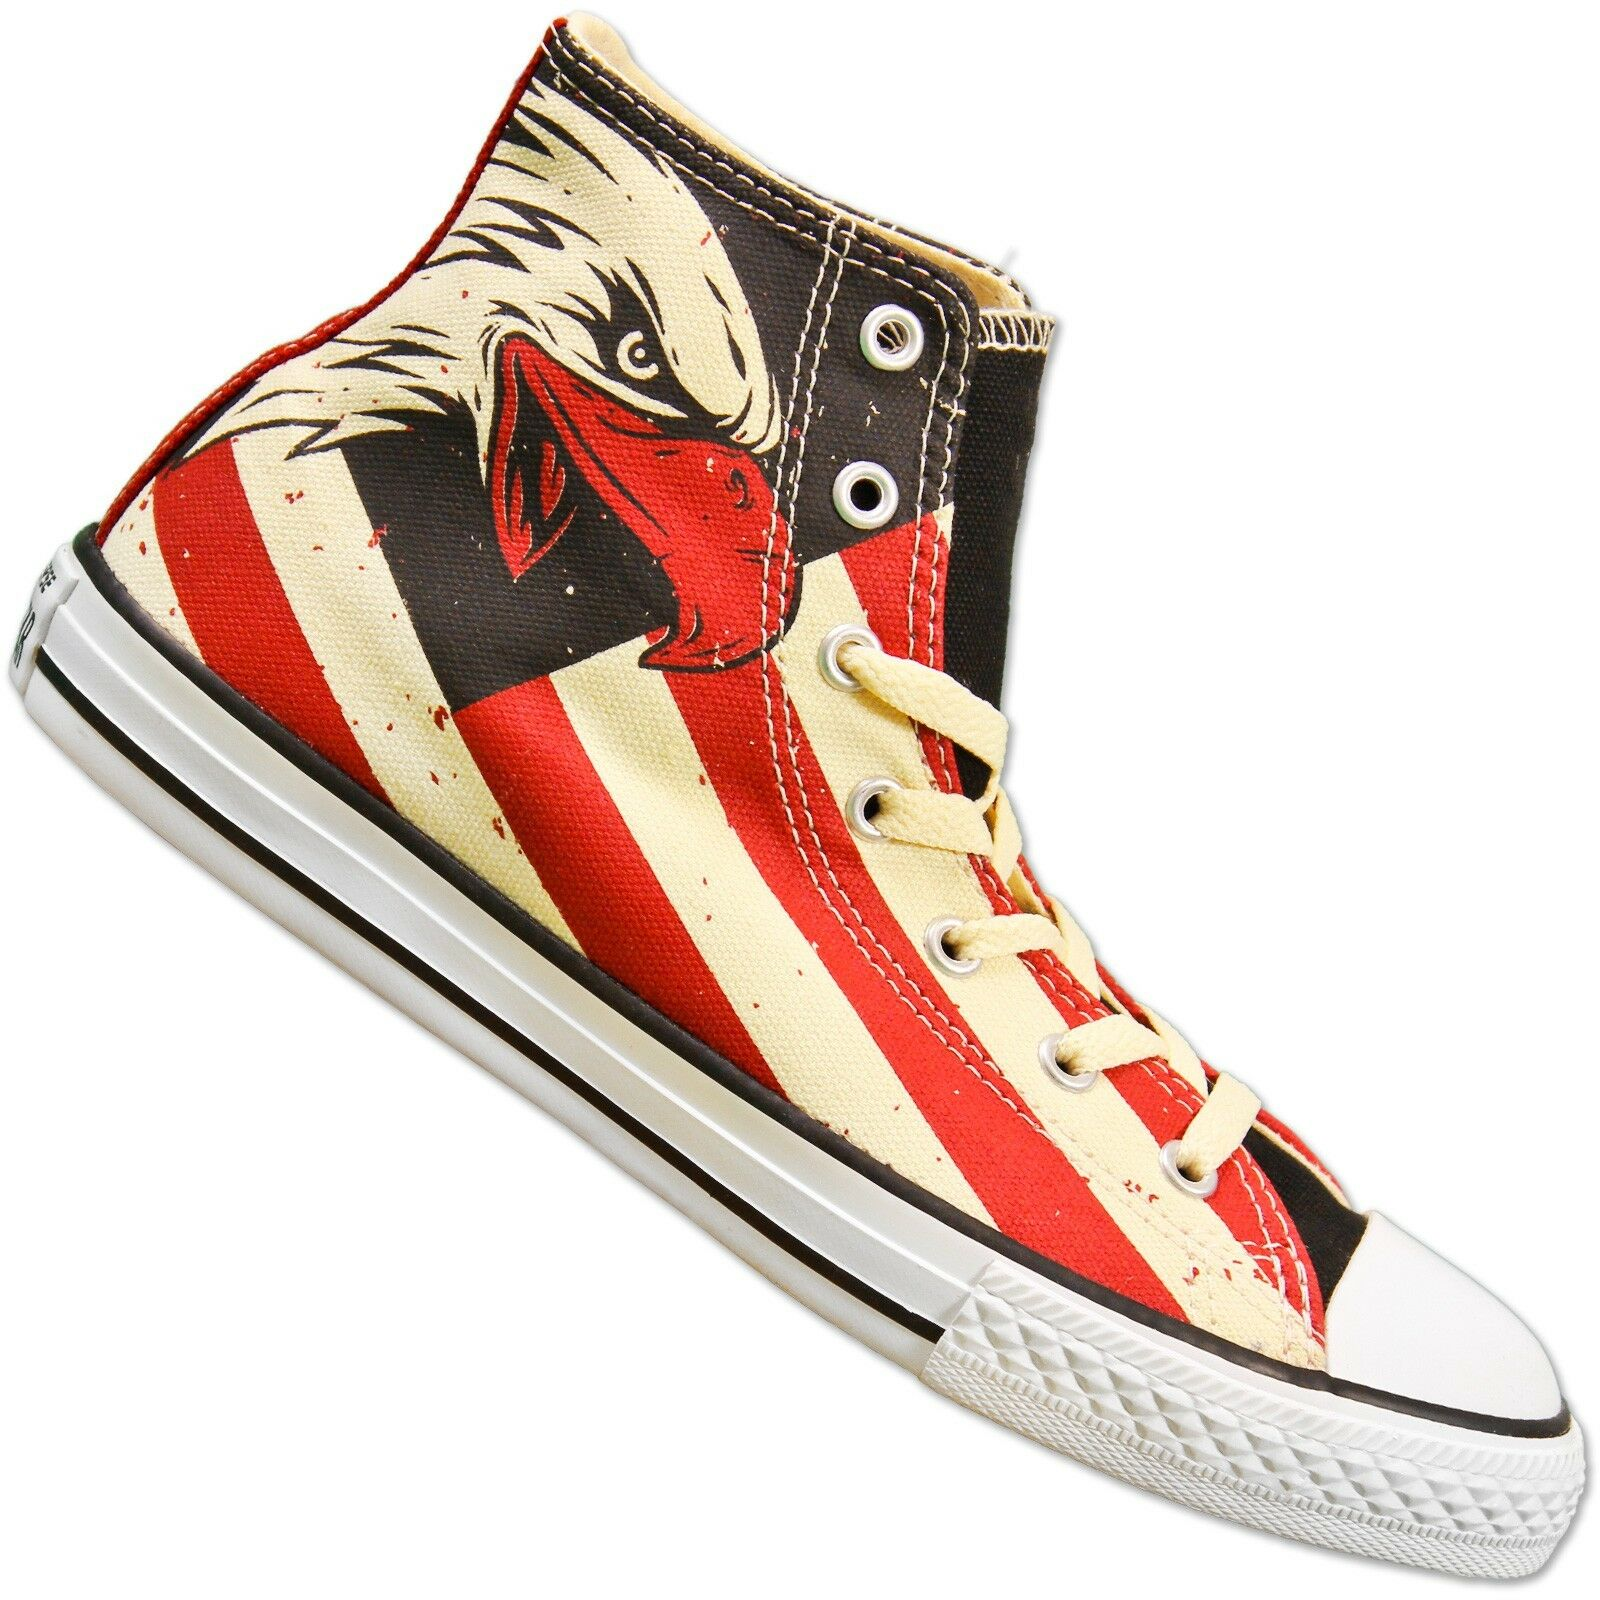 Converse All Star Chucks Taylor Hi Soon Eagle USA US Eagle Shoes 645156c